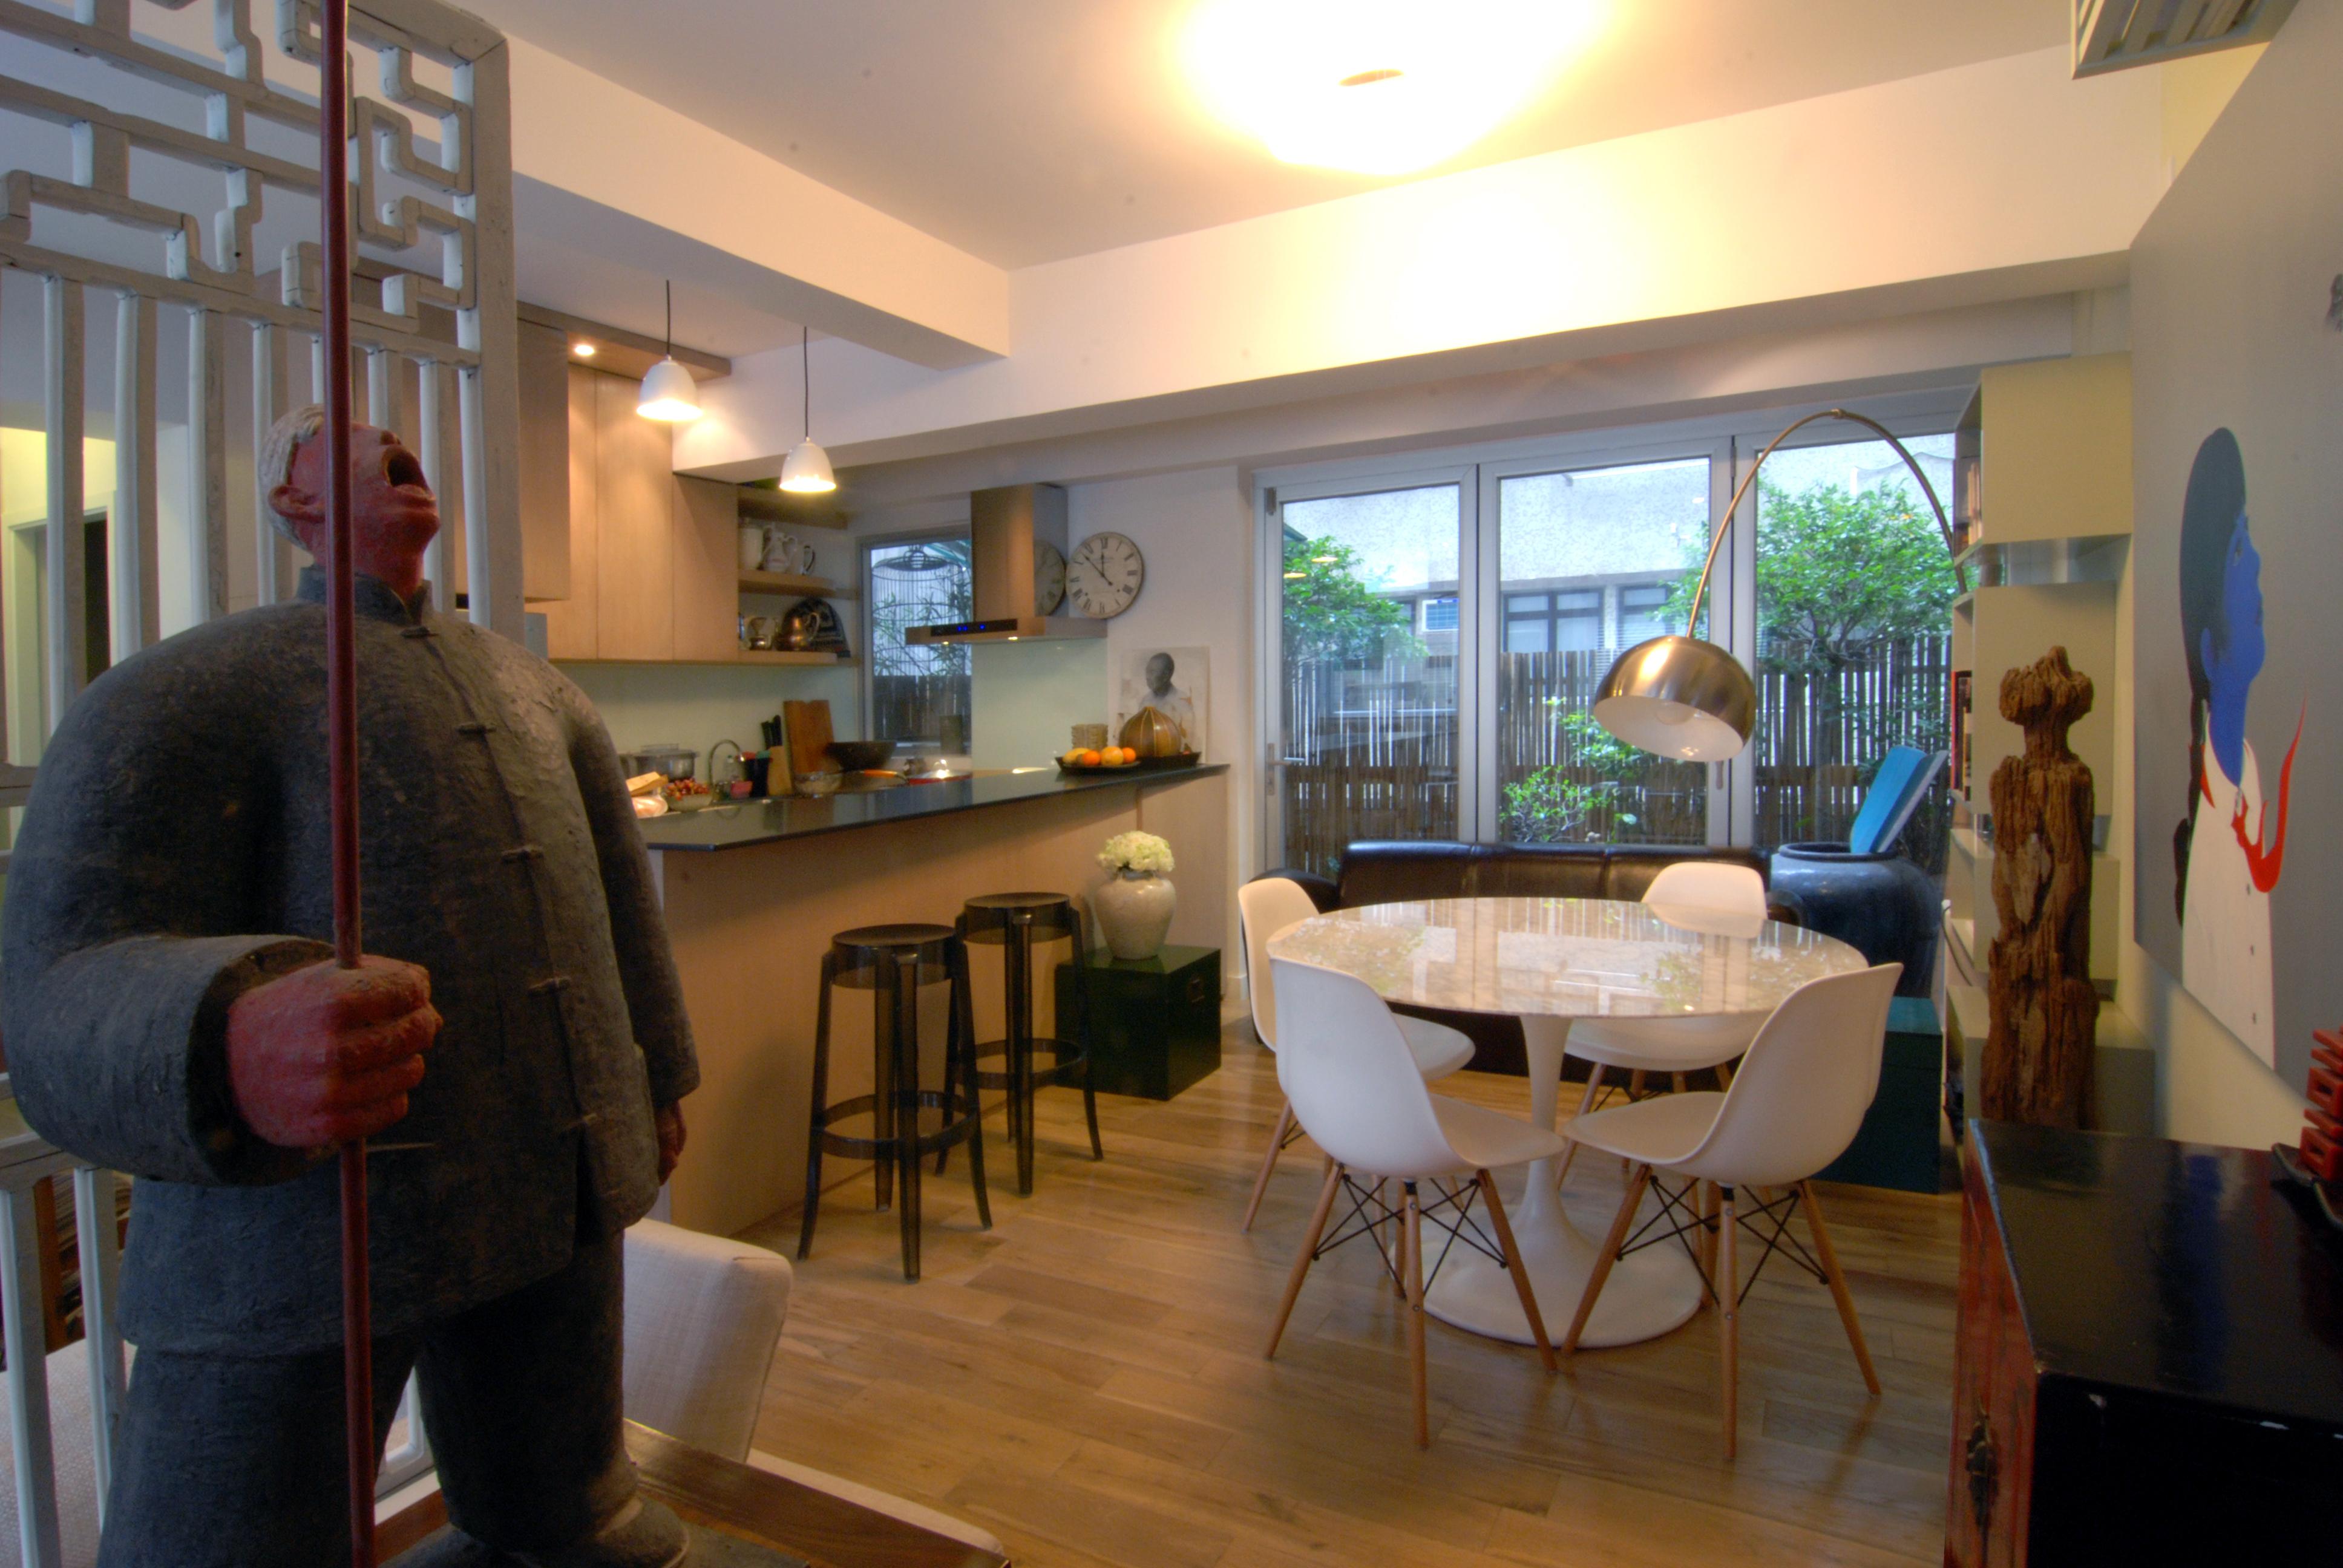 Stefano Tordiglione - Rednaxela Terrace - Living Room 1